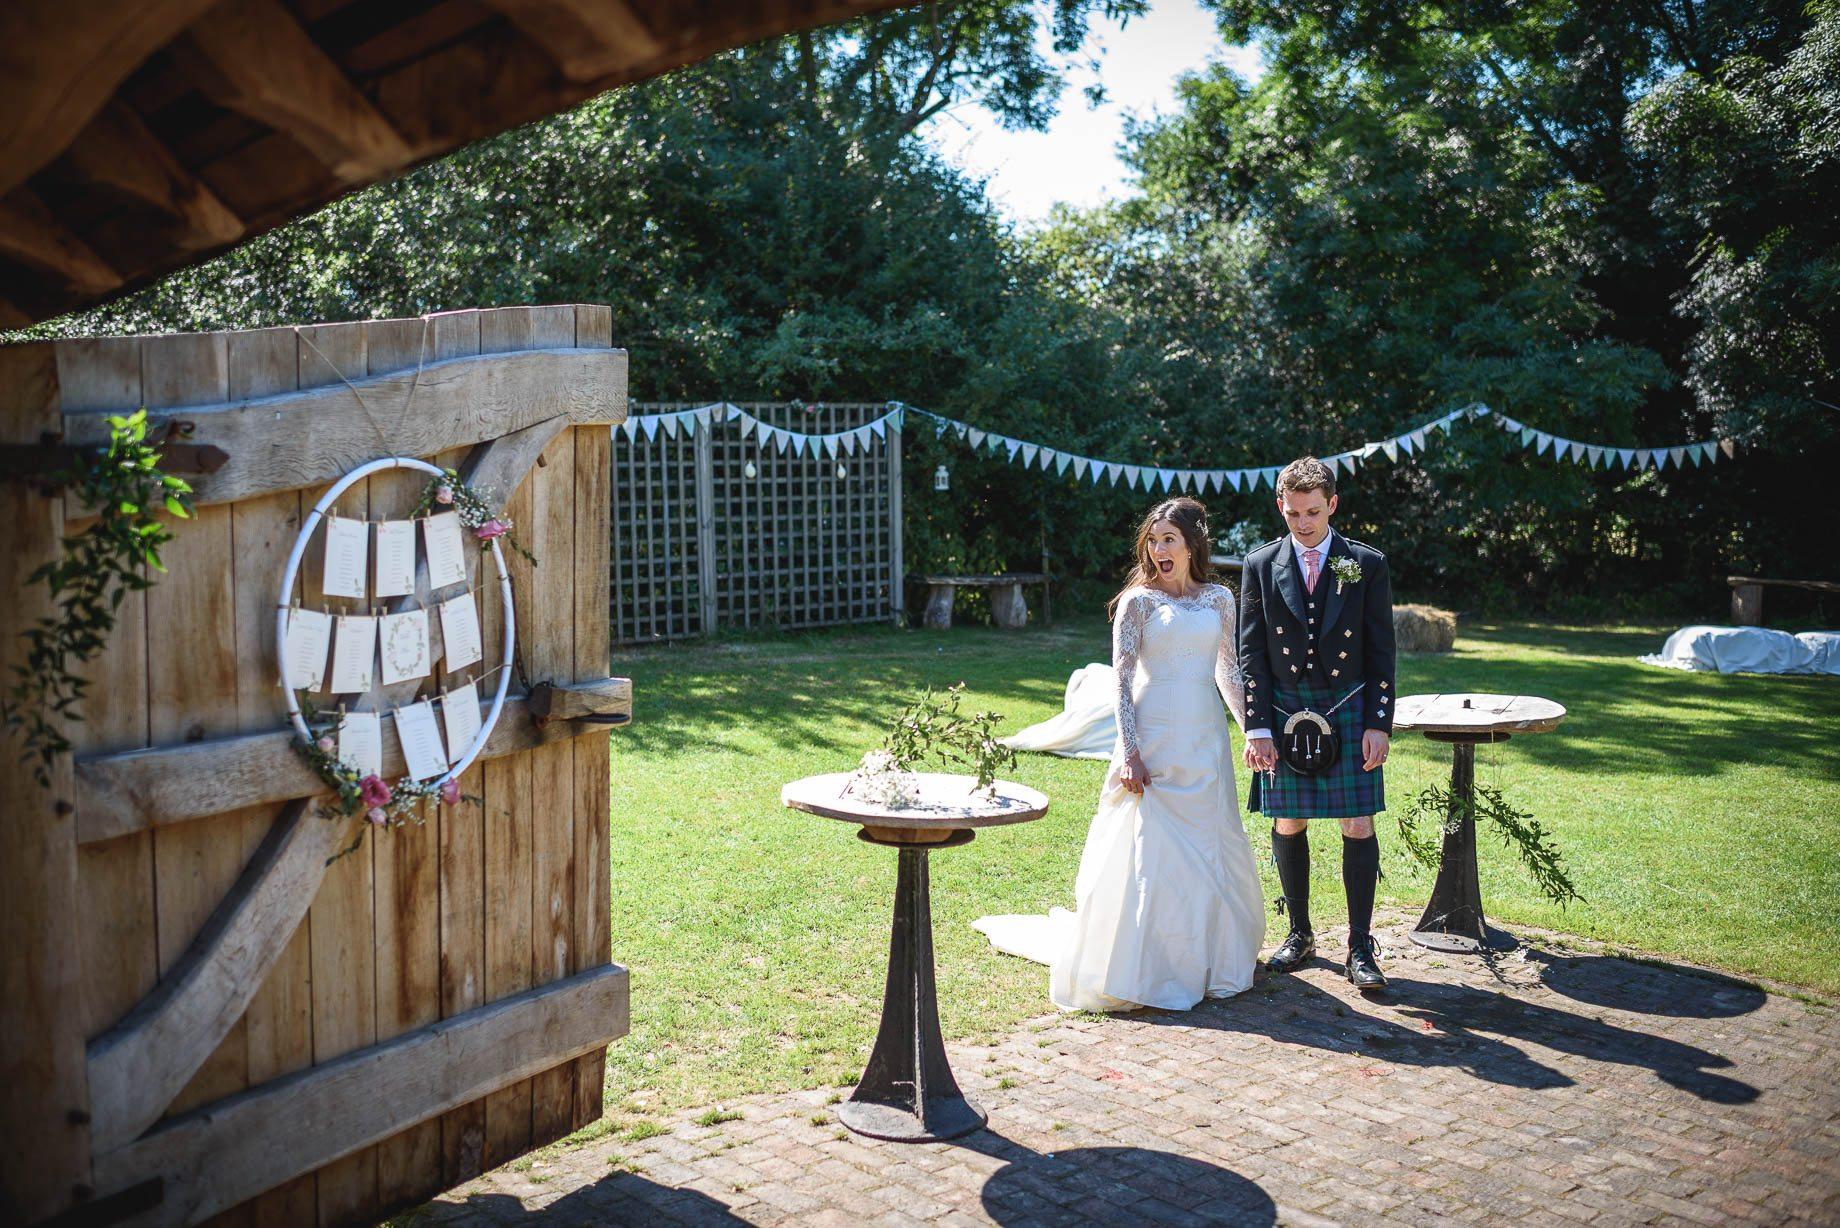 Gildings Barn wedding photography - Sarah and Steve (128 of 190)